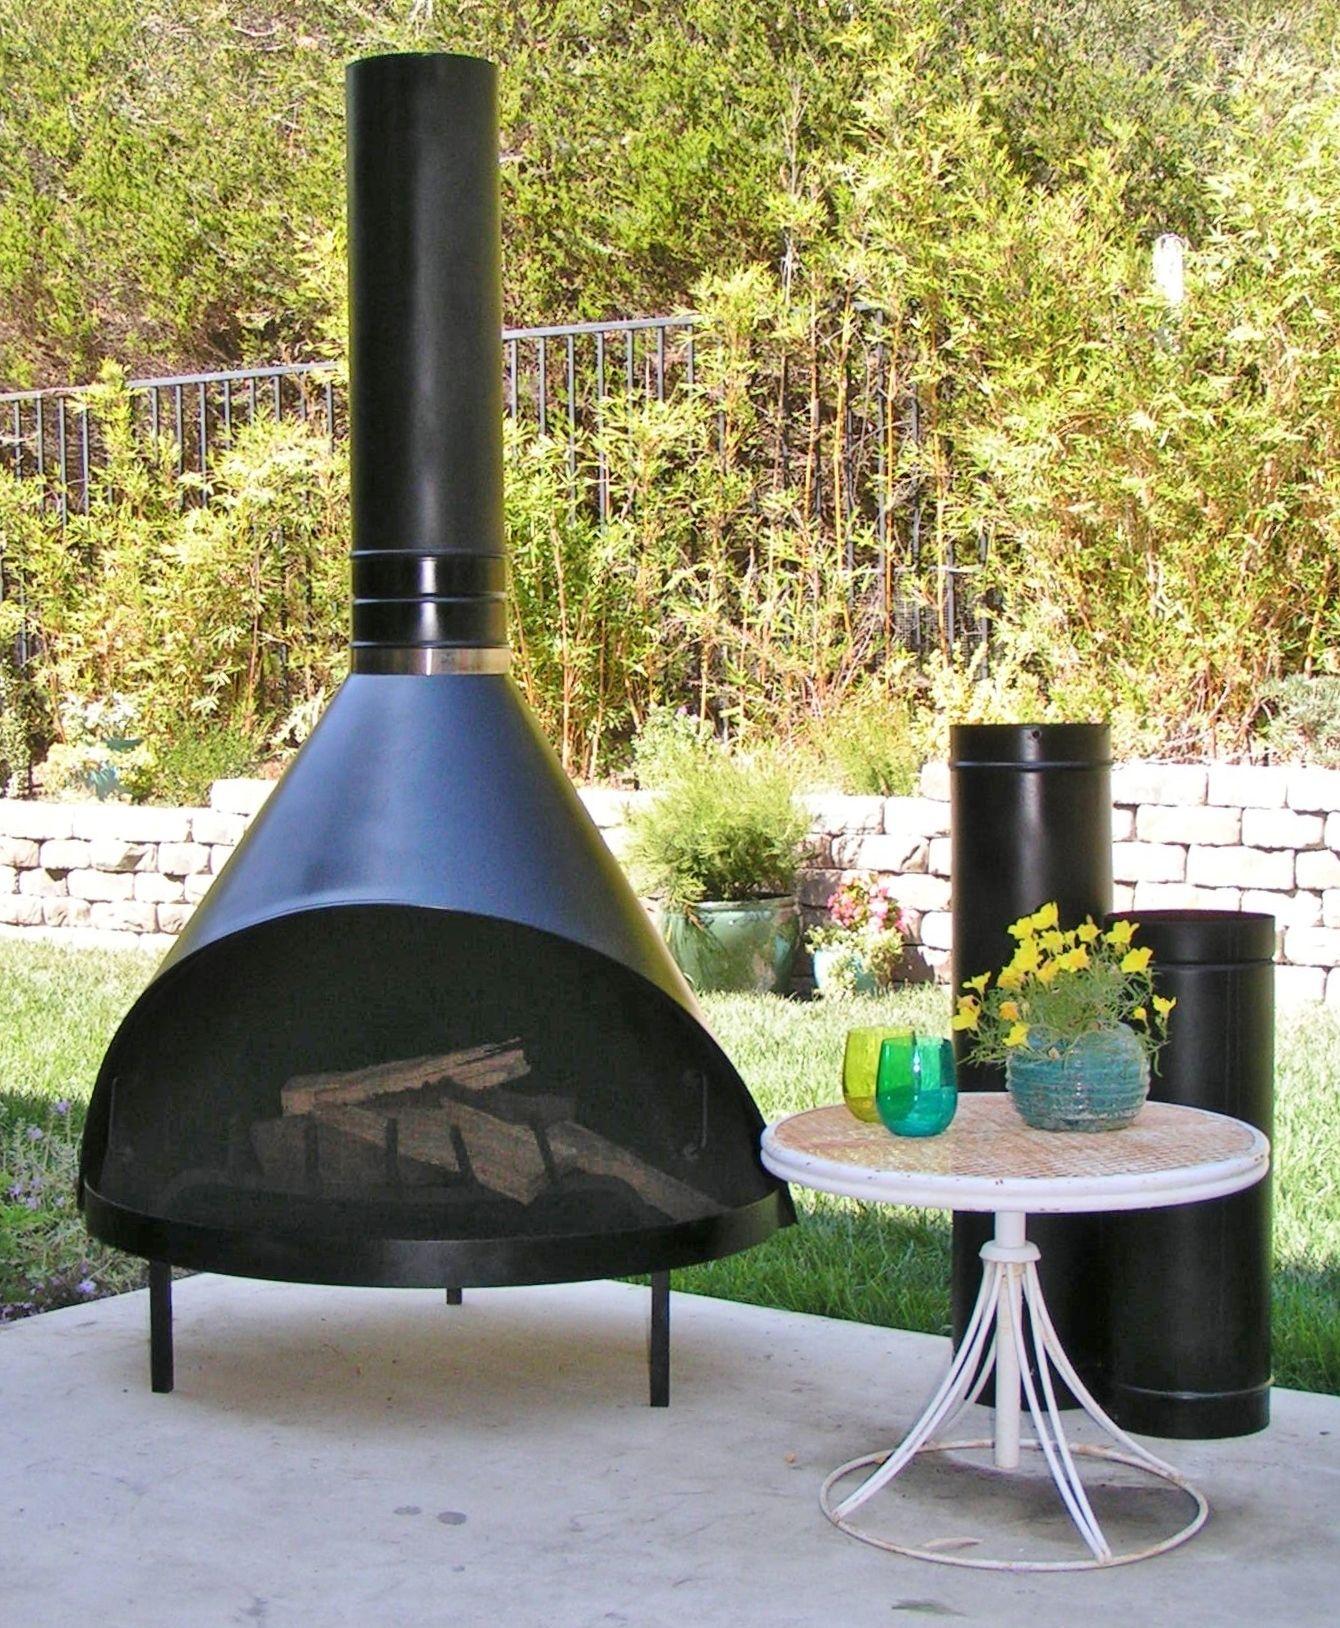 Preway Freestanding Fireplace Sleekandsimplelines